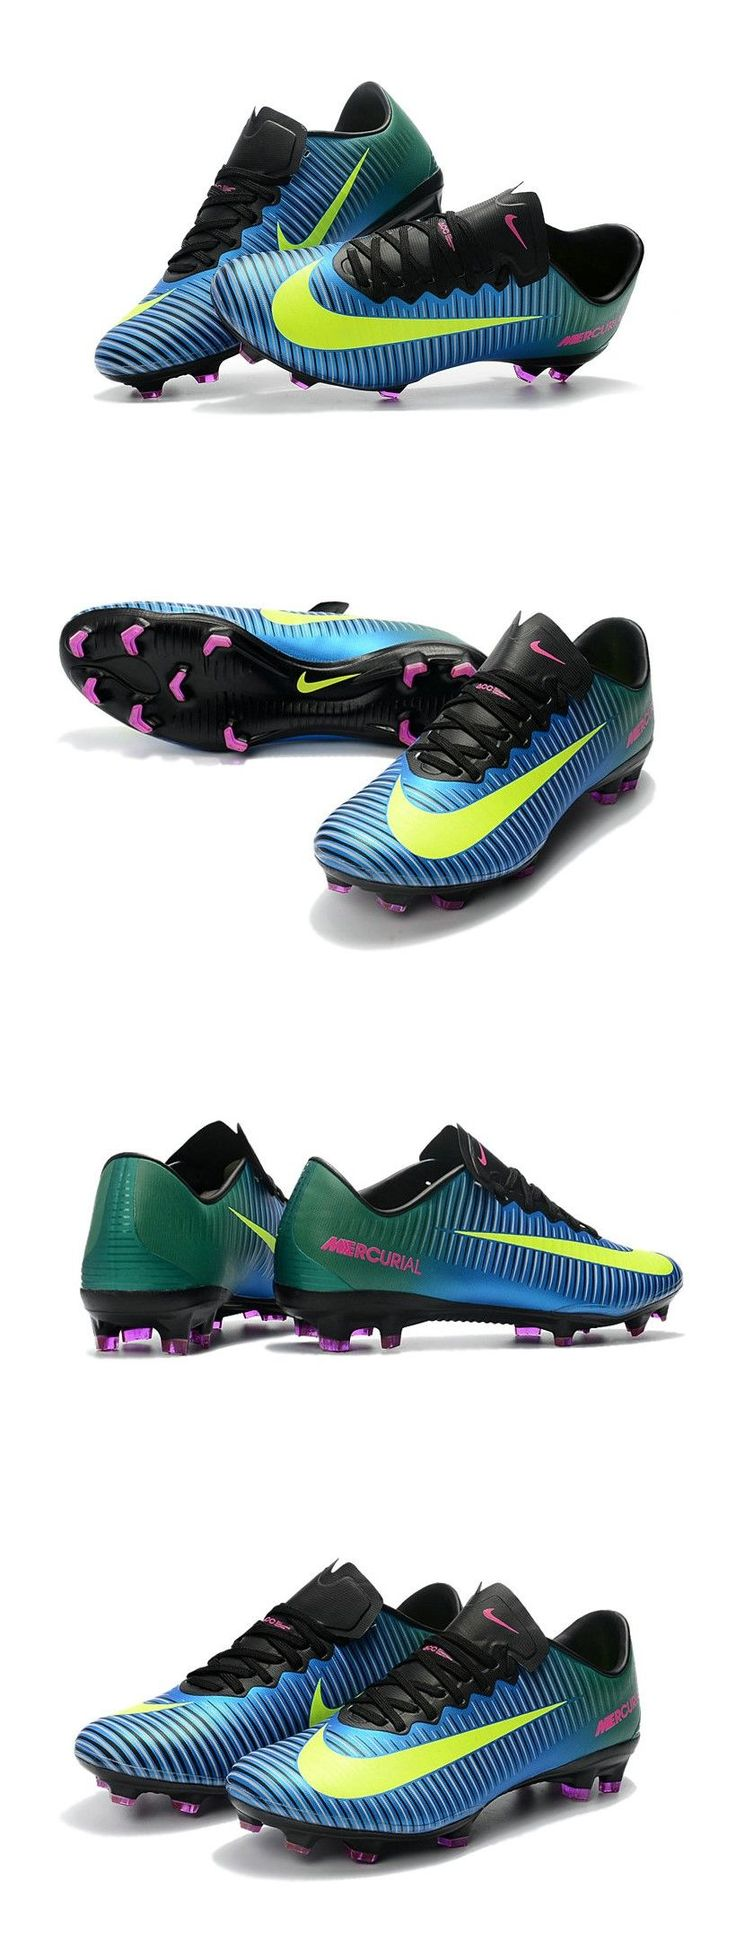 Nike Crampon de Foot Mercurial Vapor 11 FG ACC Bleu Blanc #futbolbotines